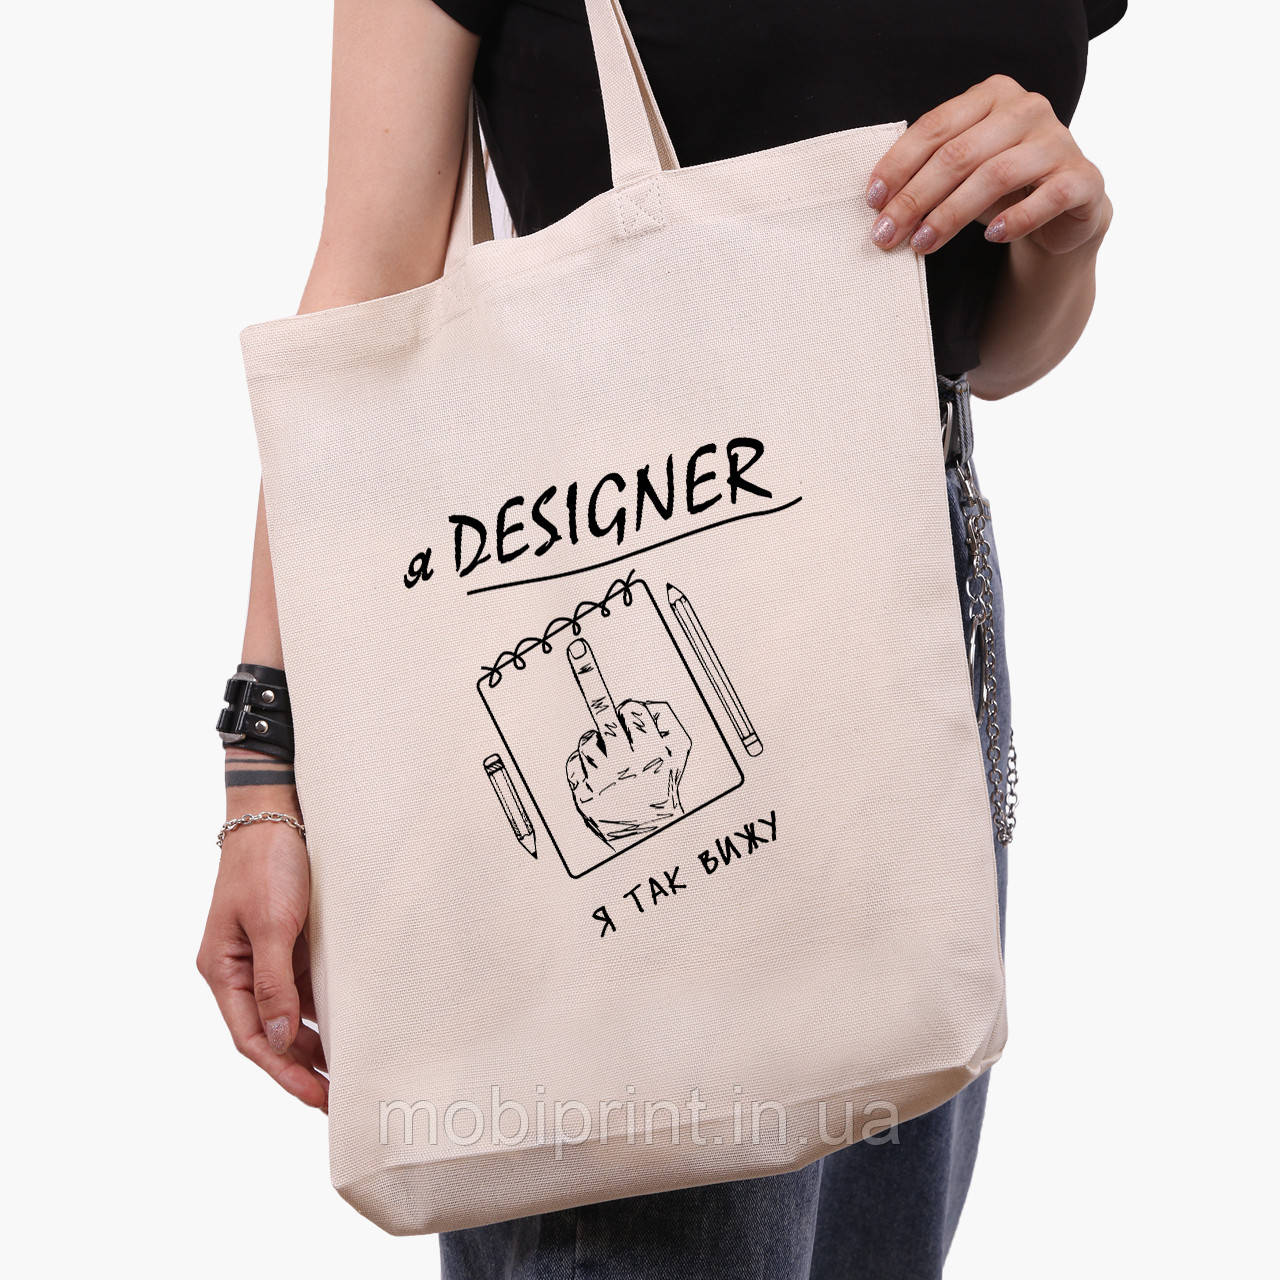 Еко сумка шоппер з принтом Я дизайнер я так бачу (9227-1545) Білий